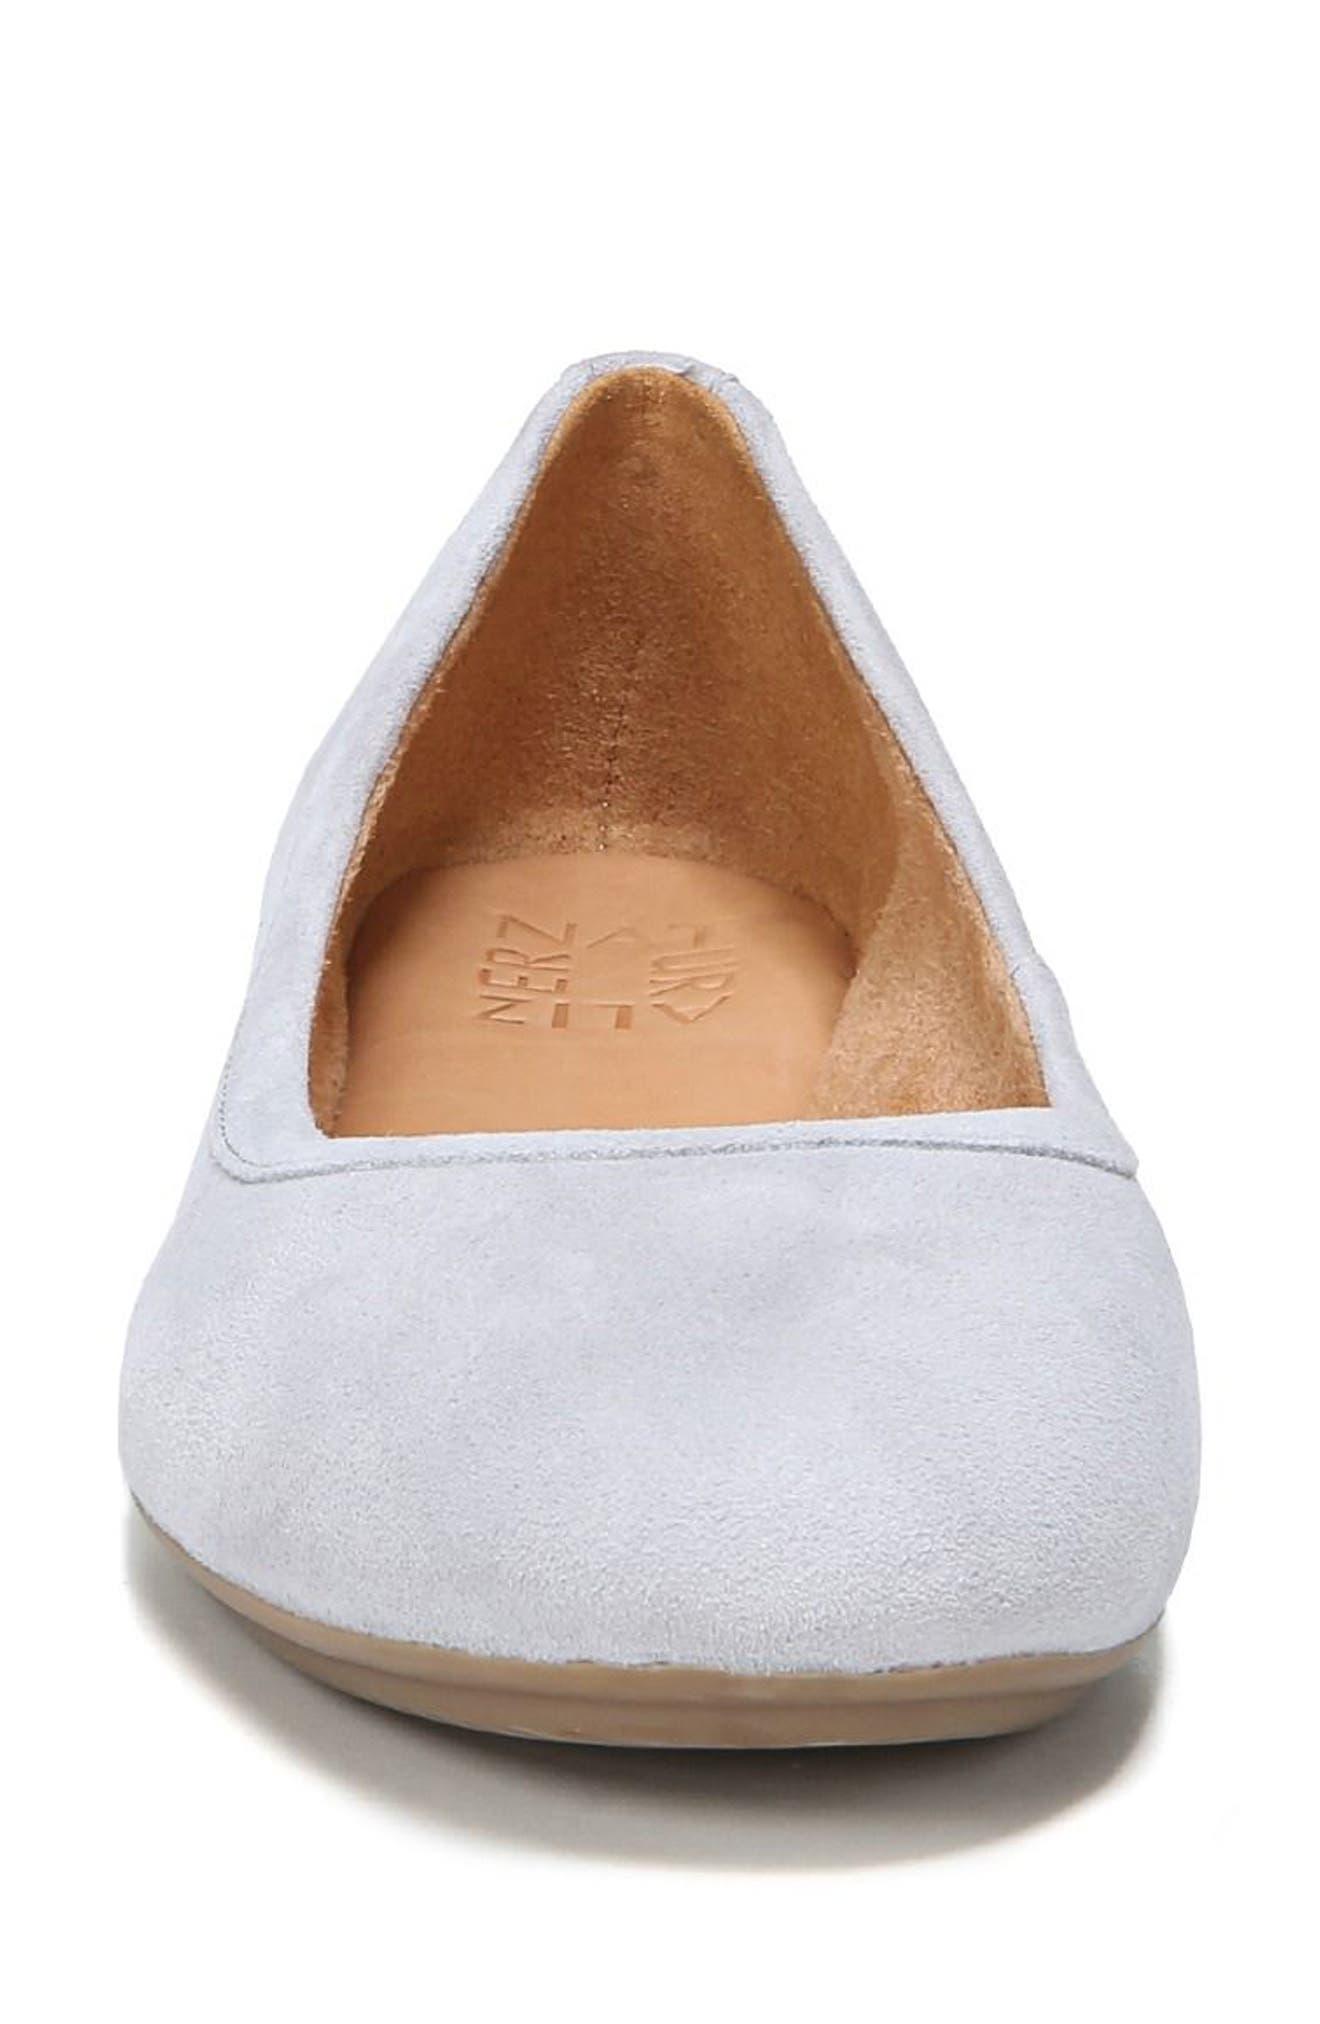 Brittany Ballet Flat,                             Alternate thumbnail 44, color,